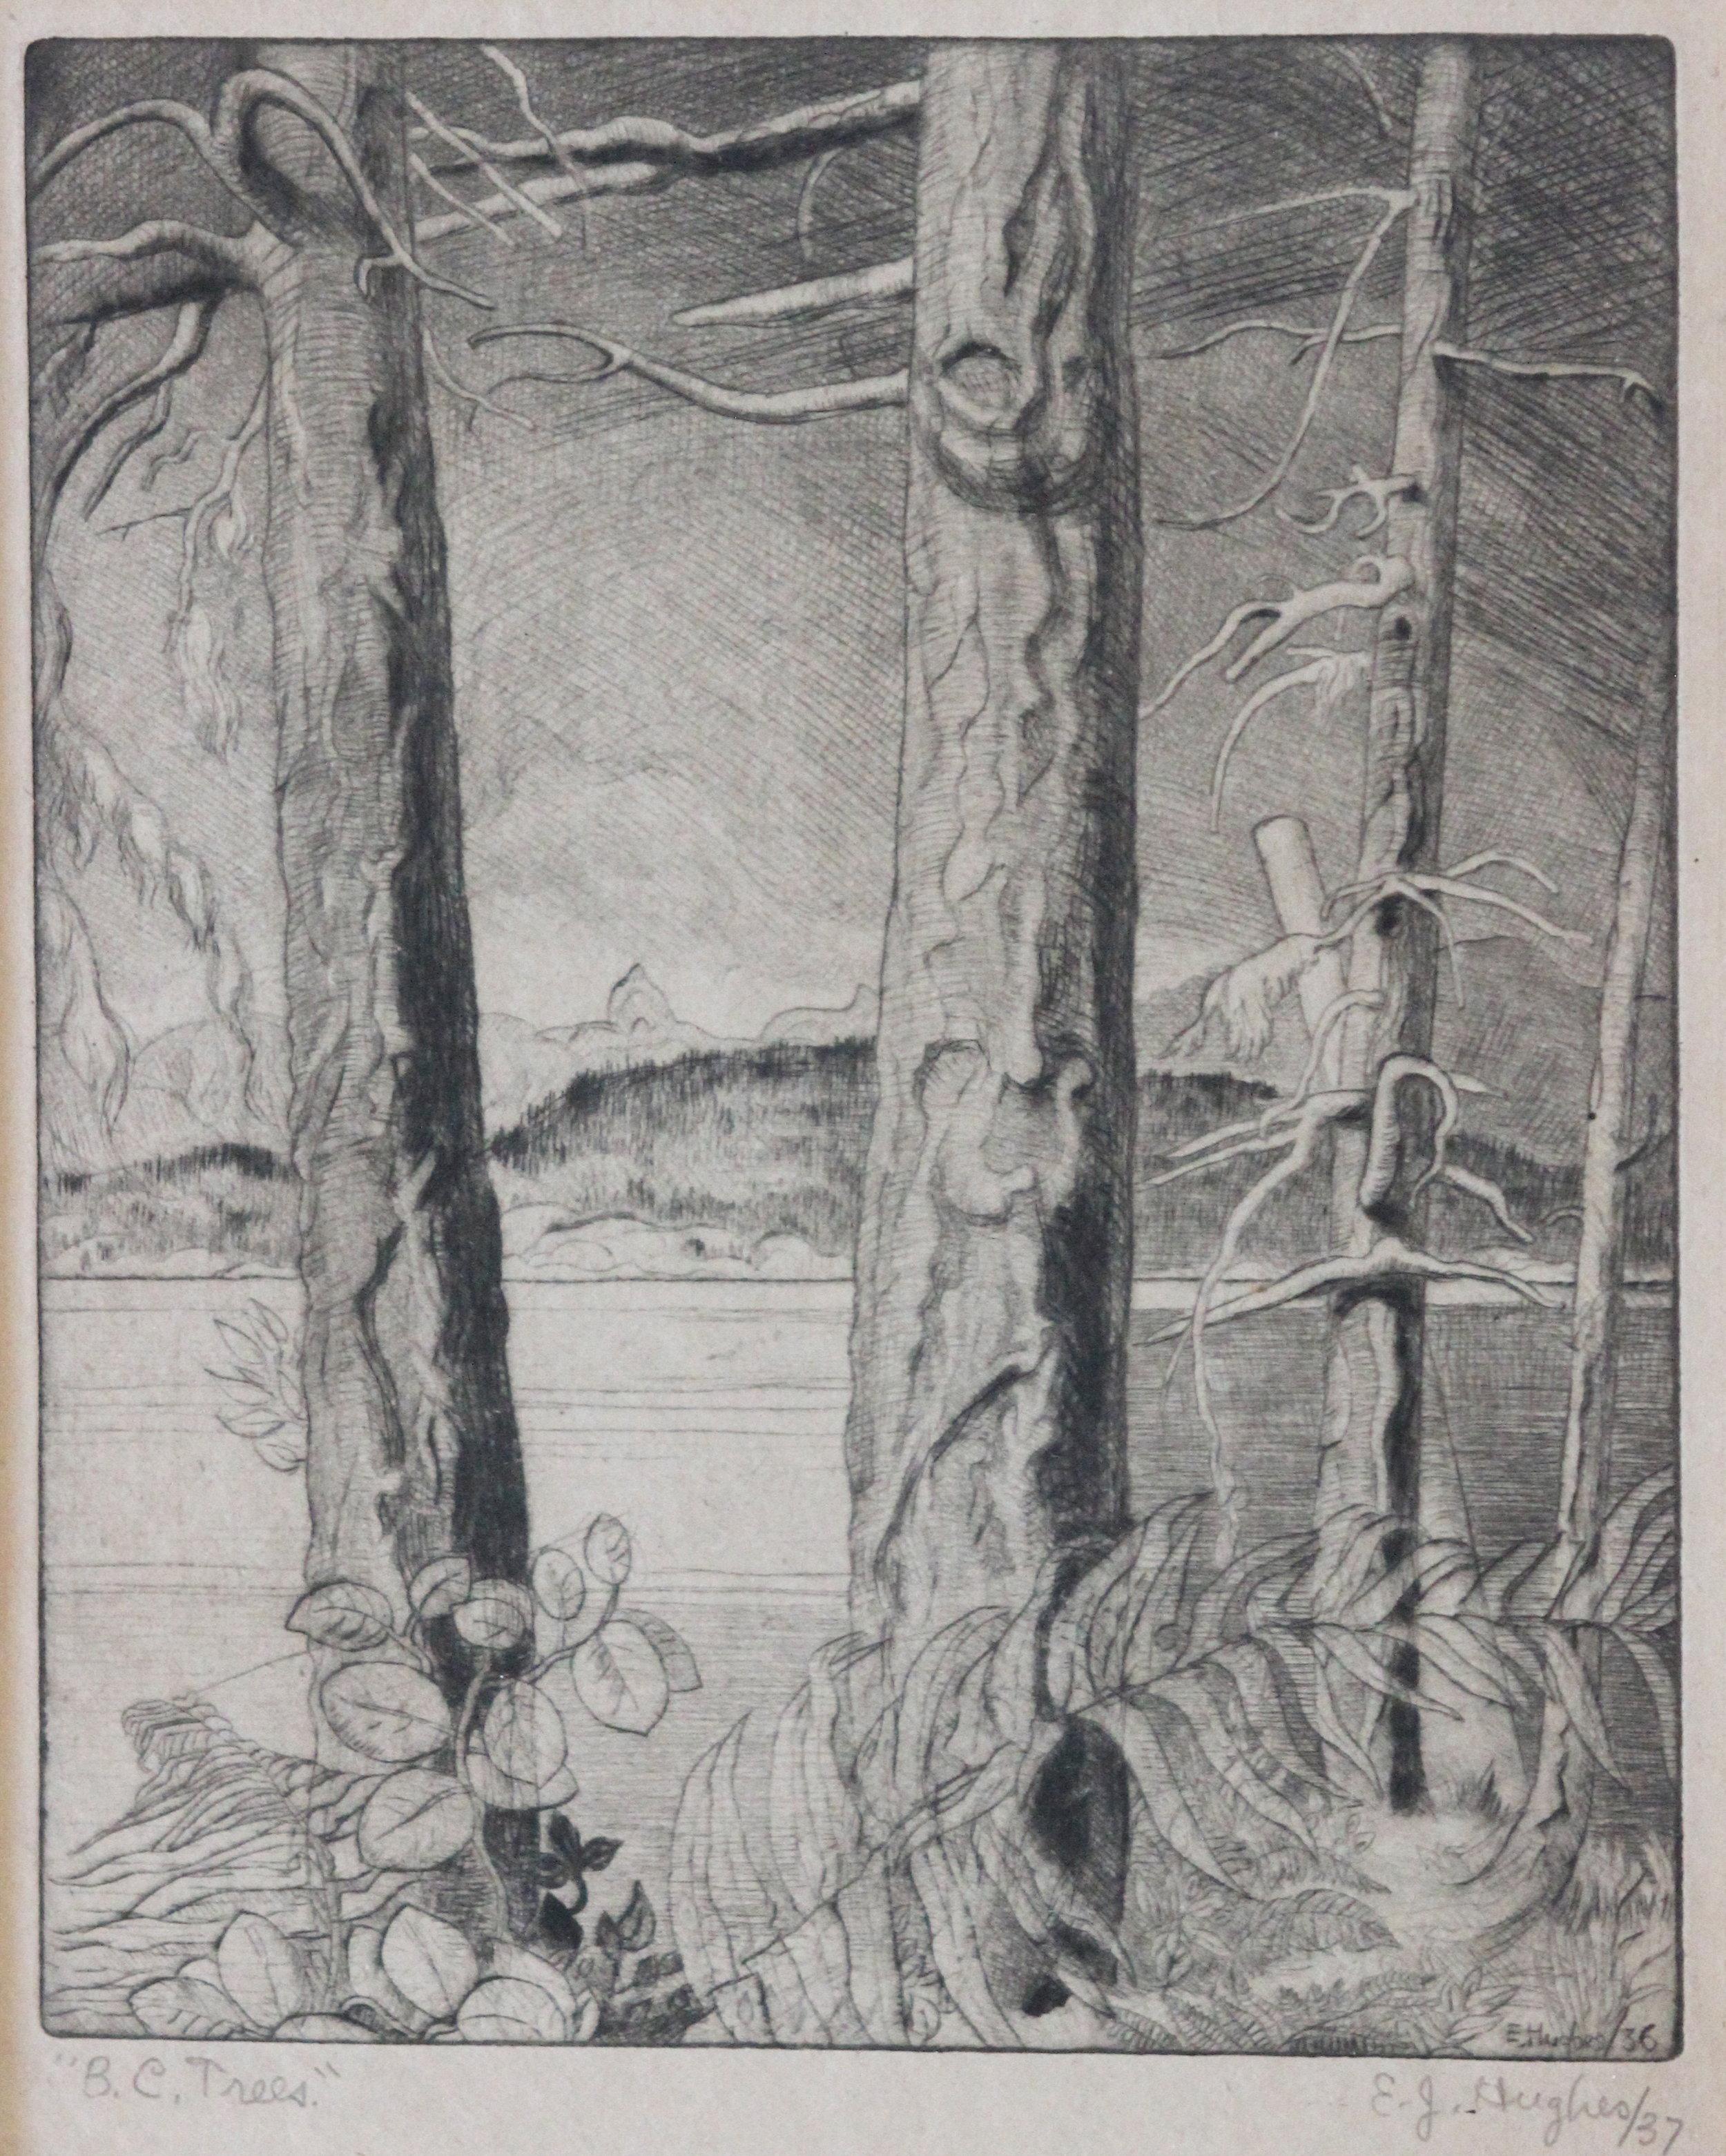 E.J Hughes, BC Trees, 1936/37